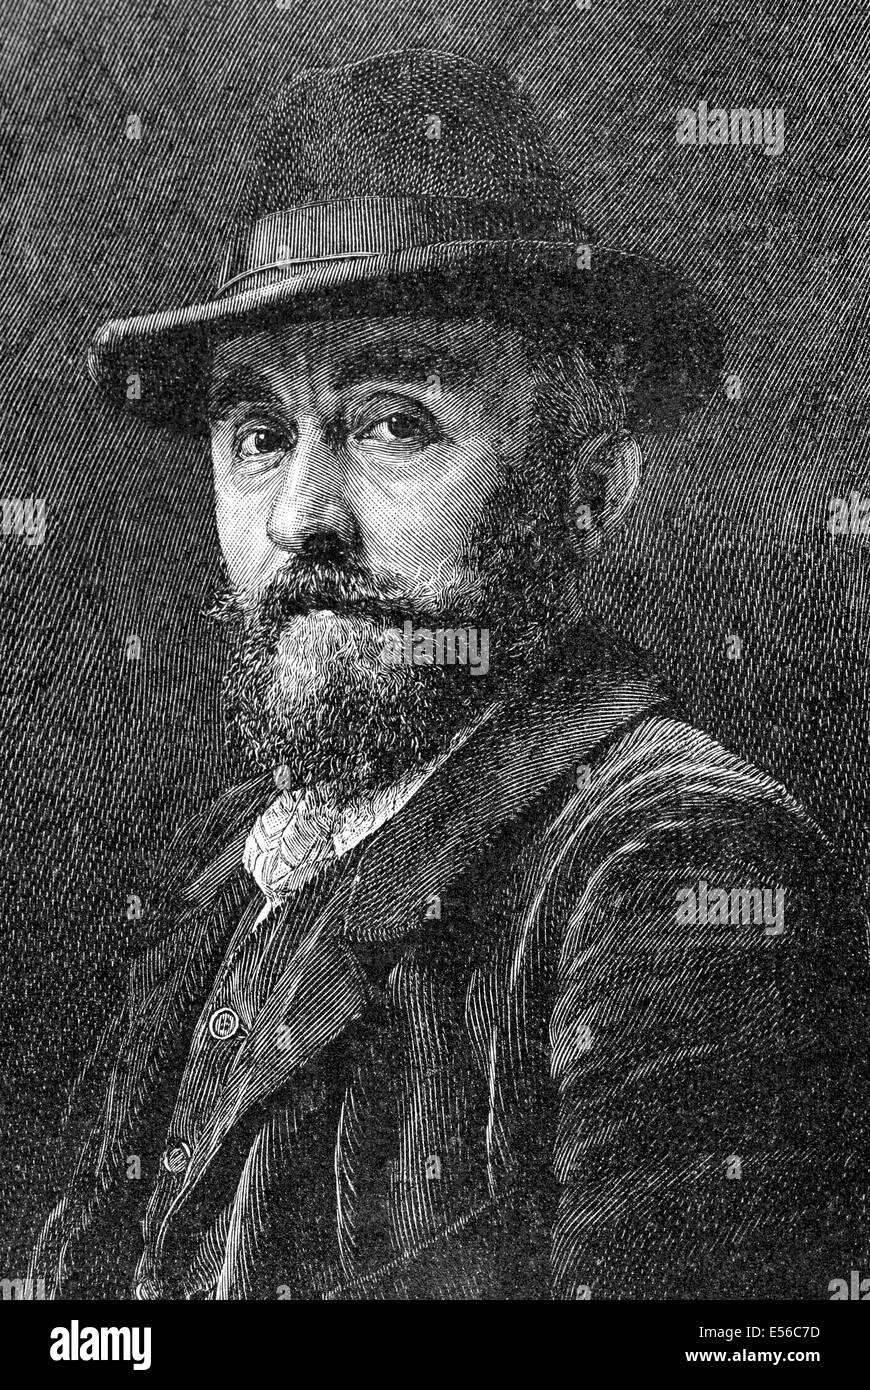 Adolf Mannchen (1860-1920). German painter. Engraving. La Ilustracion Artistica, 1899. Stock Photo